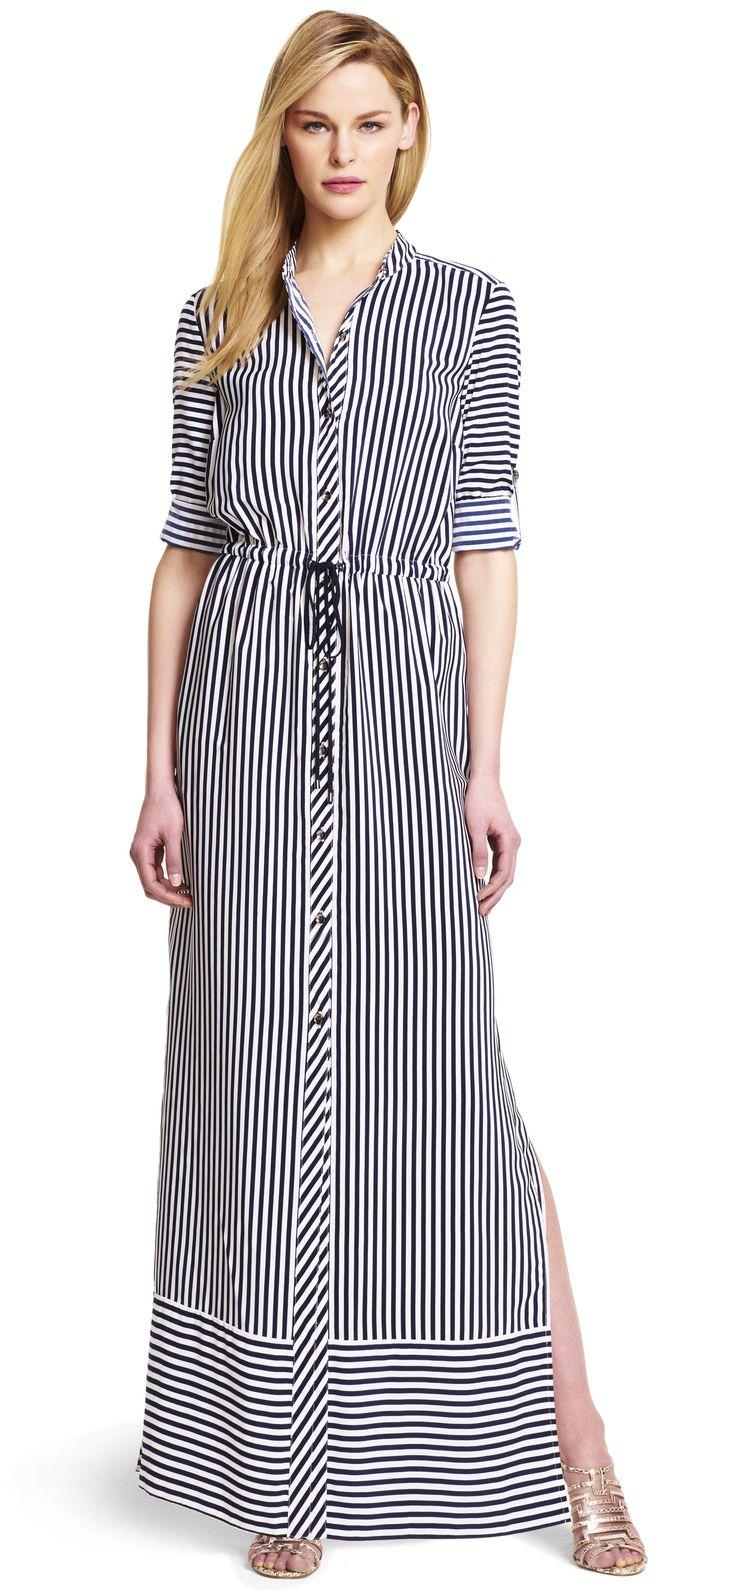 Adrianna Papell Striped Maxi Shirtdress.